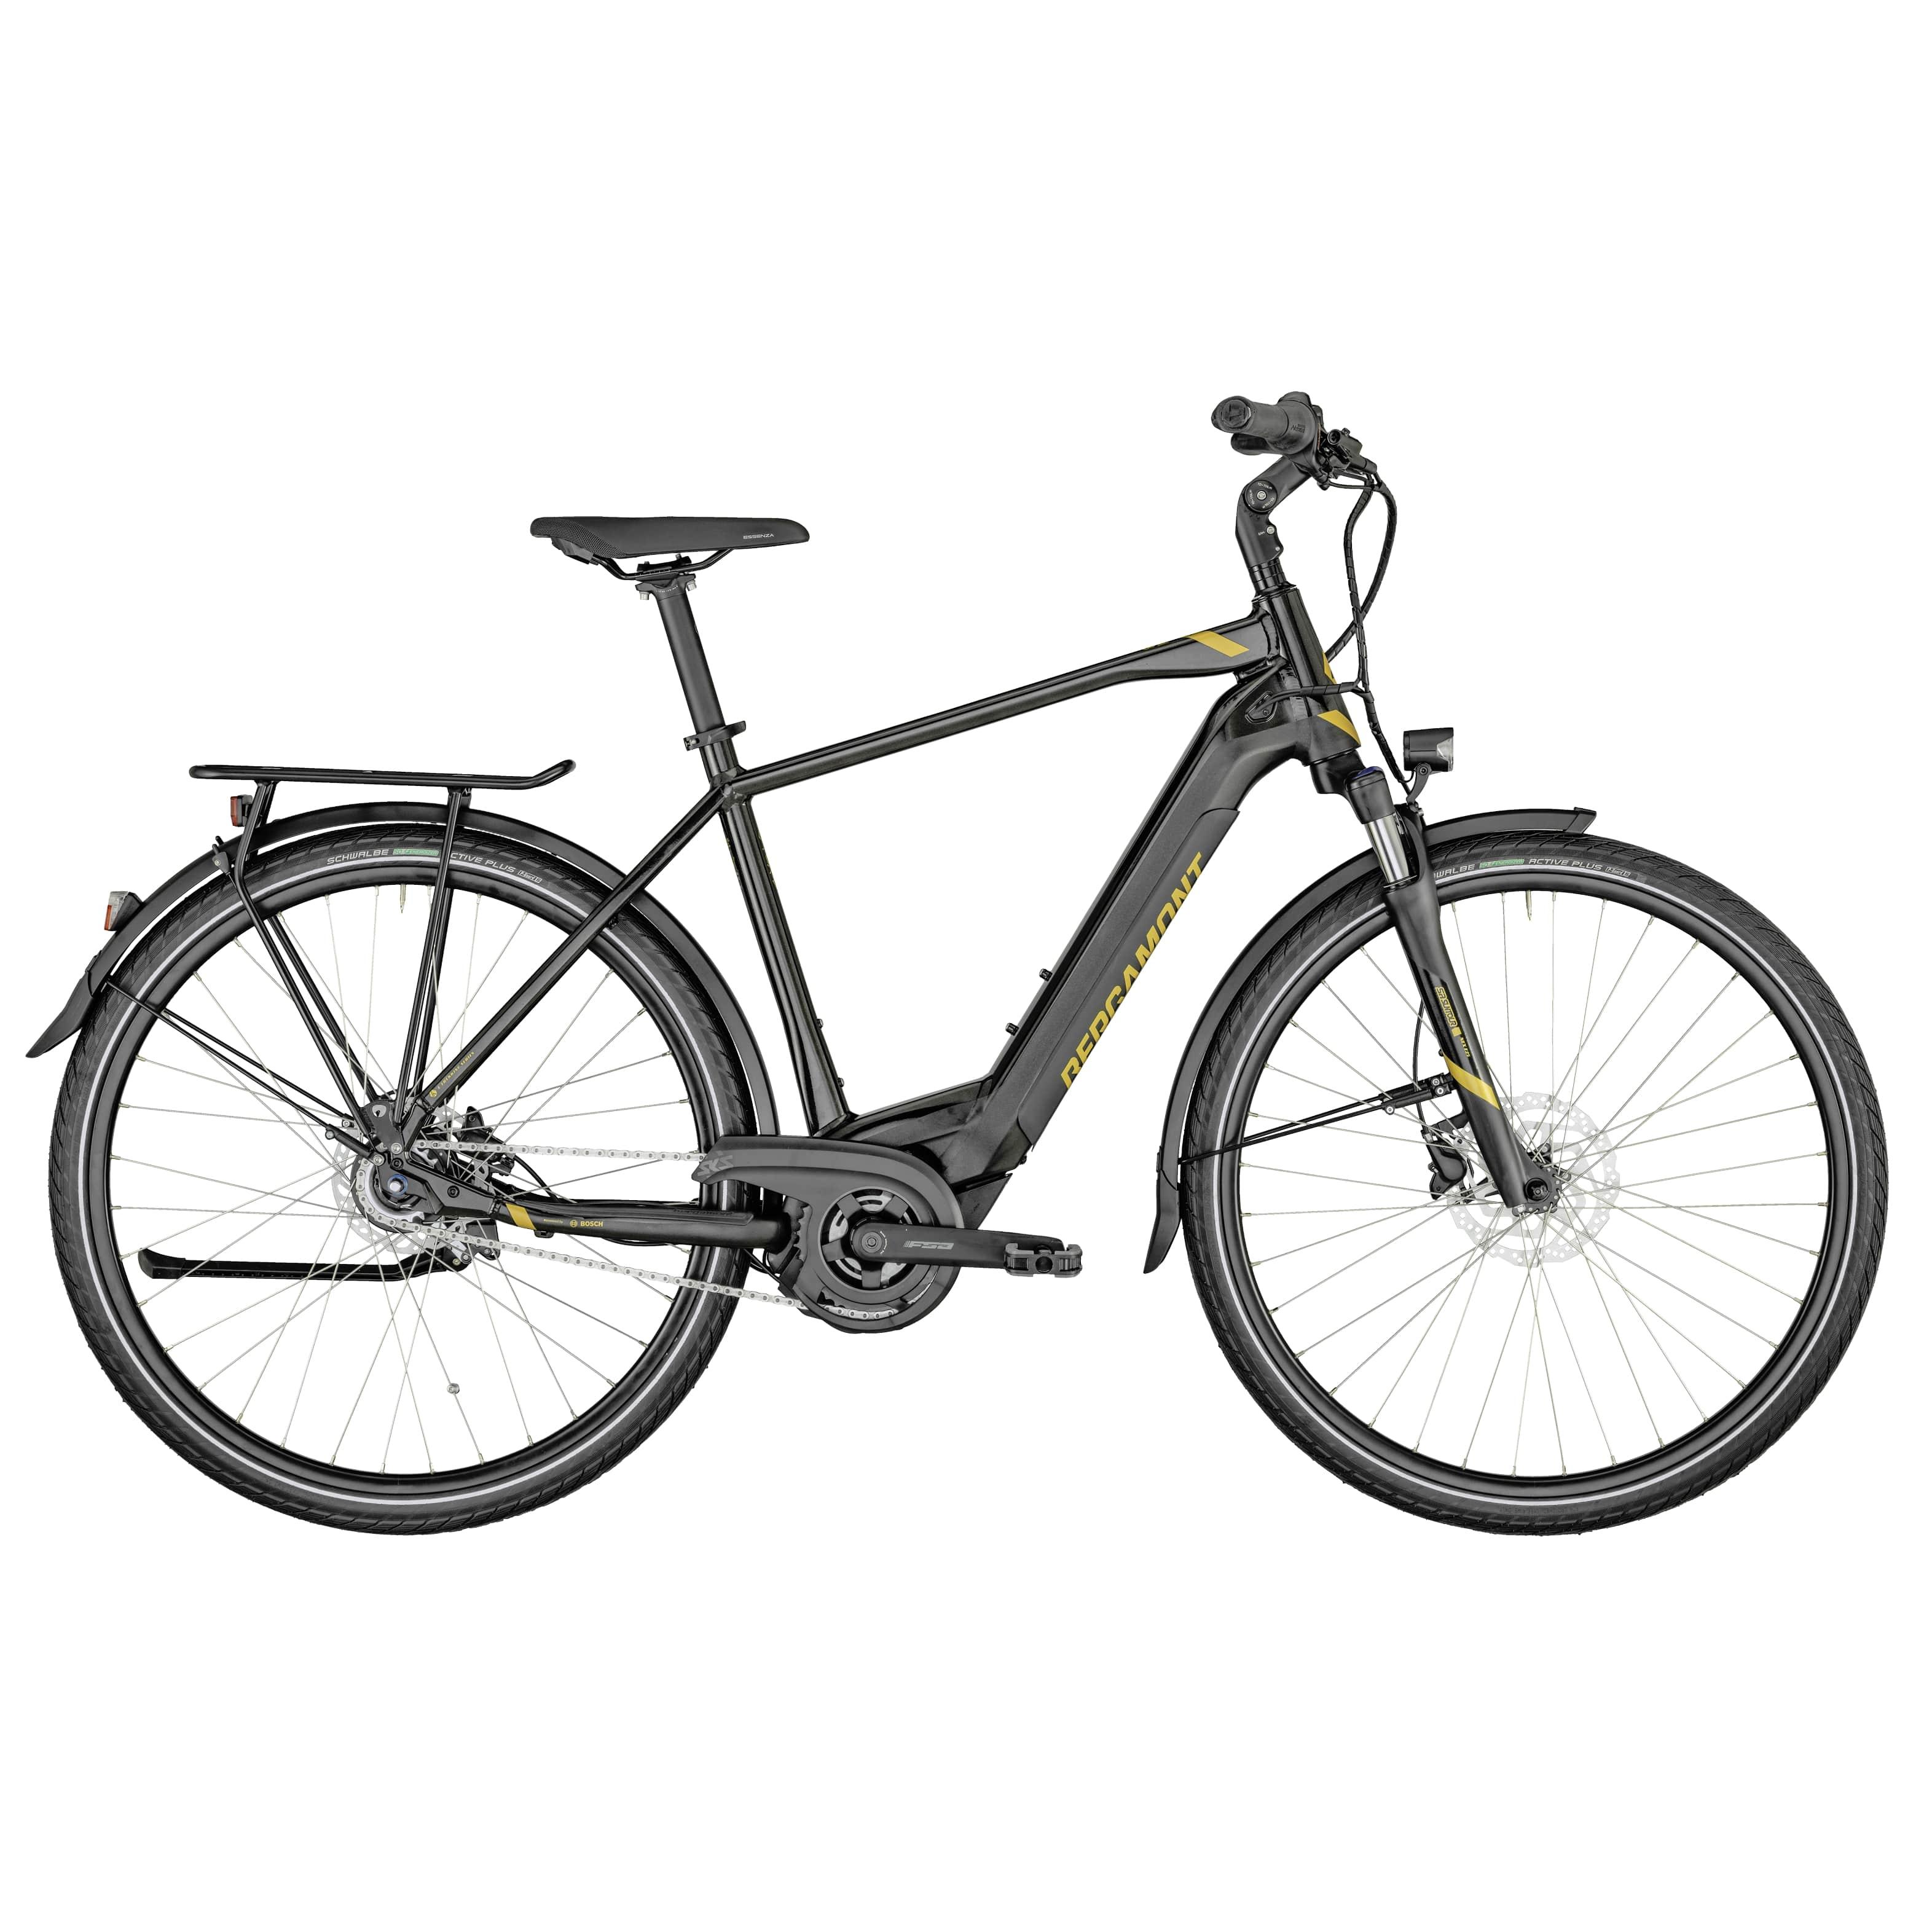 "BGM Bike E-Horizon N8 CB 500 Gent, Diamant, L56 - 500WH, Rücktritt, black gold dust, 28"", MJ2021"